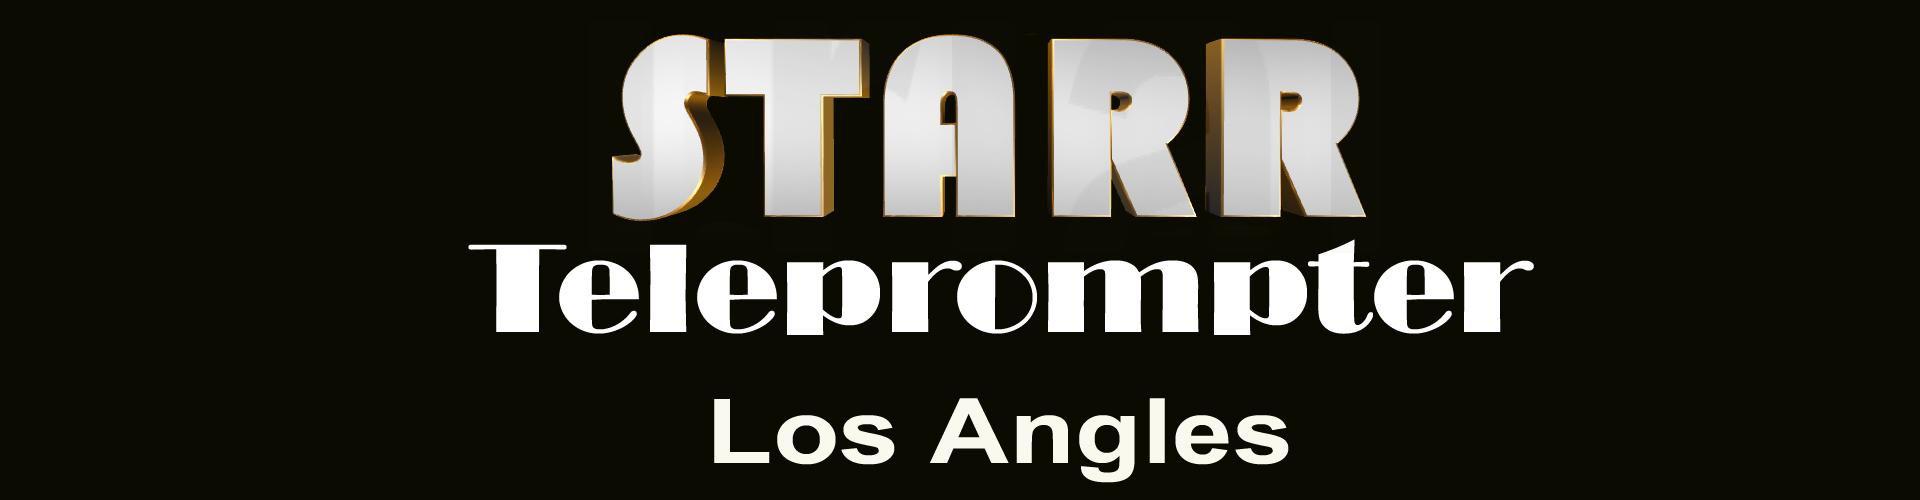 Teleprompter operator los Angeles